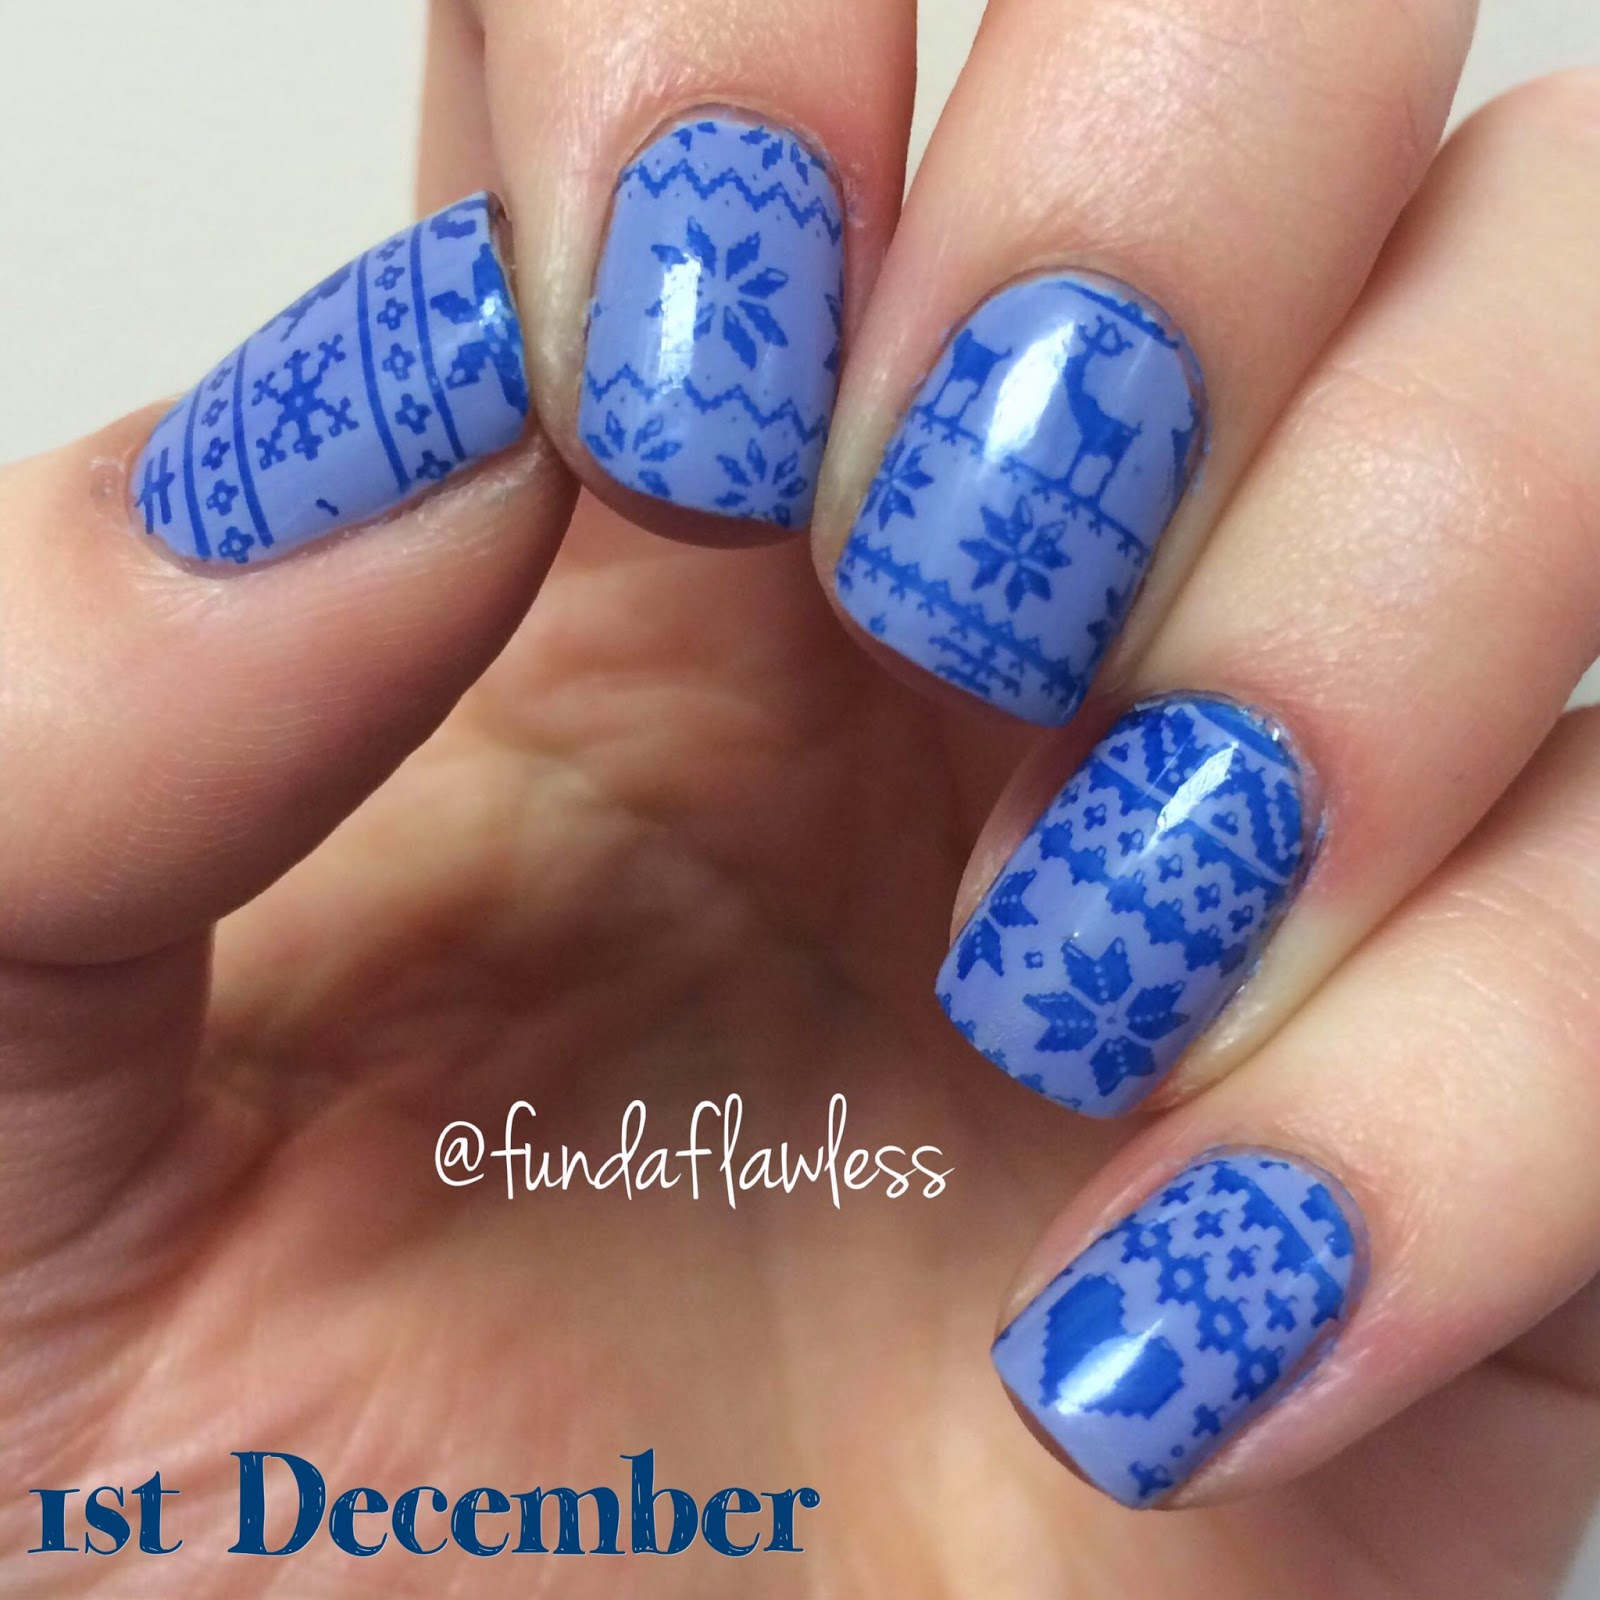 Blue Christmas Nail Art: Fundamentally Flawless: December 2014